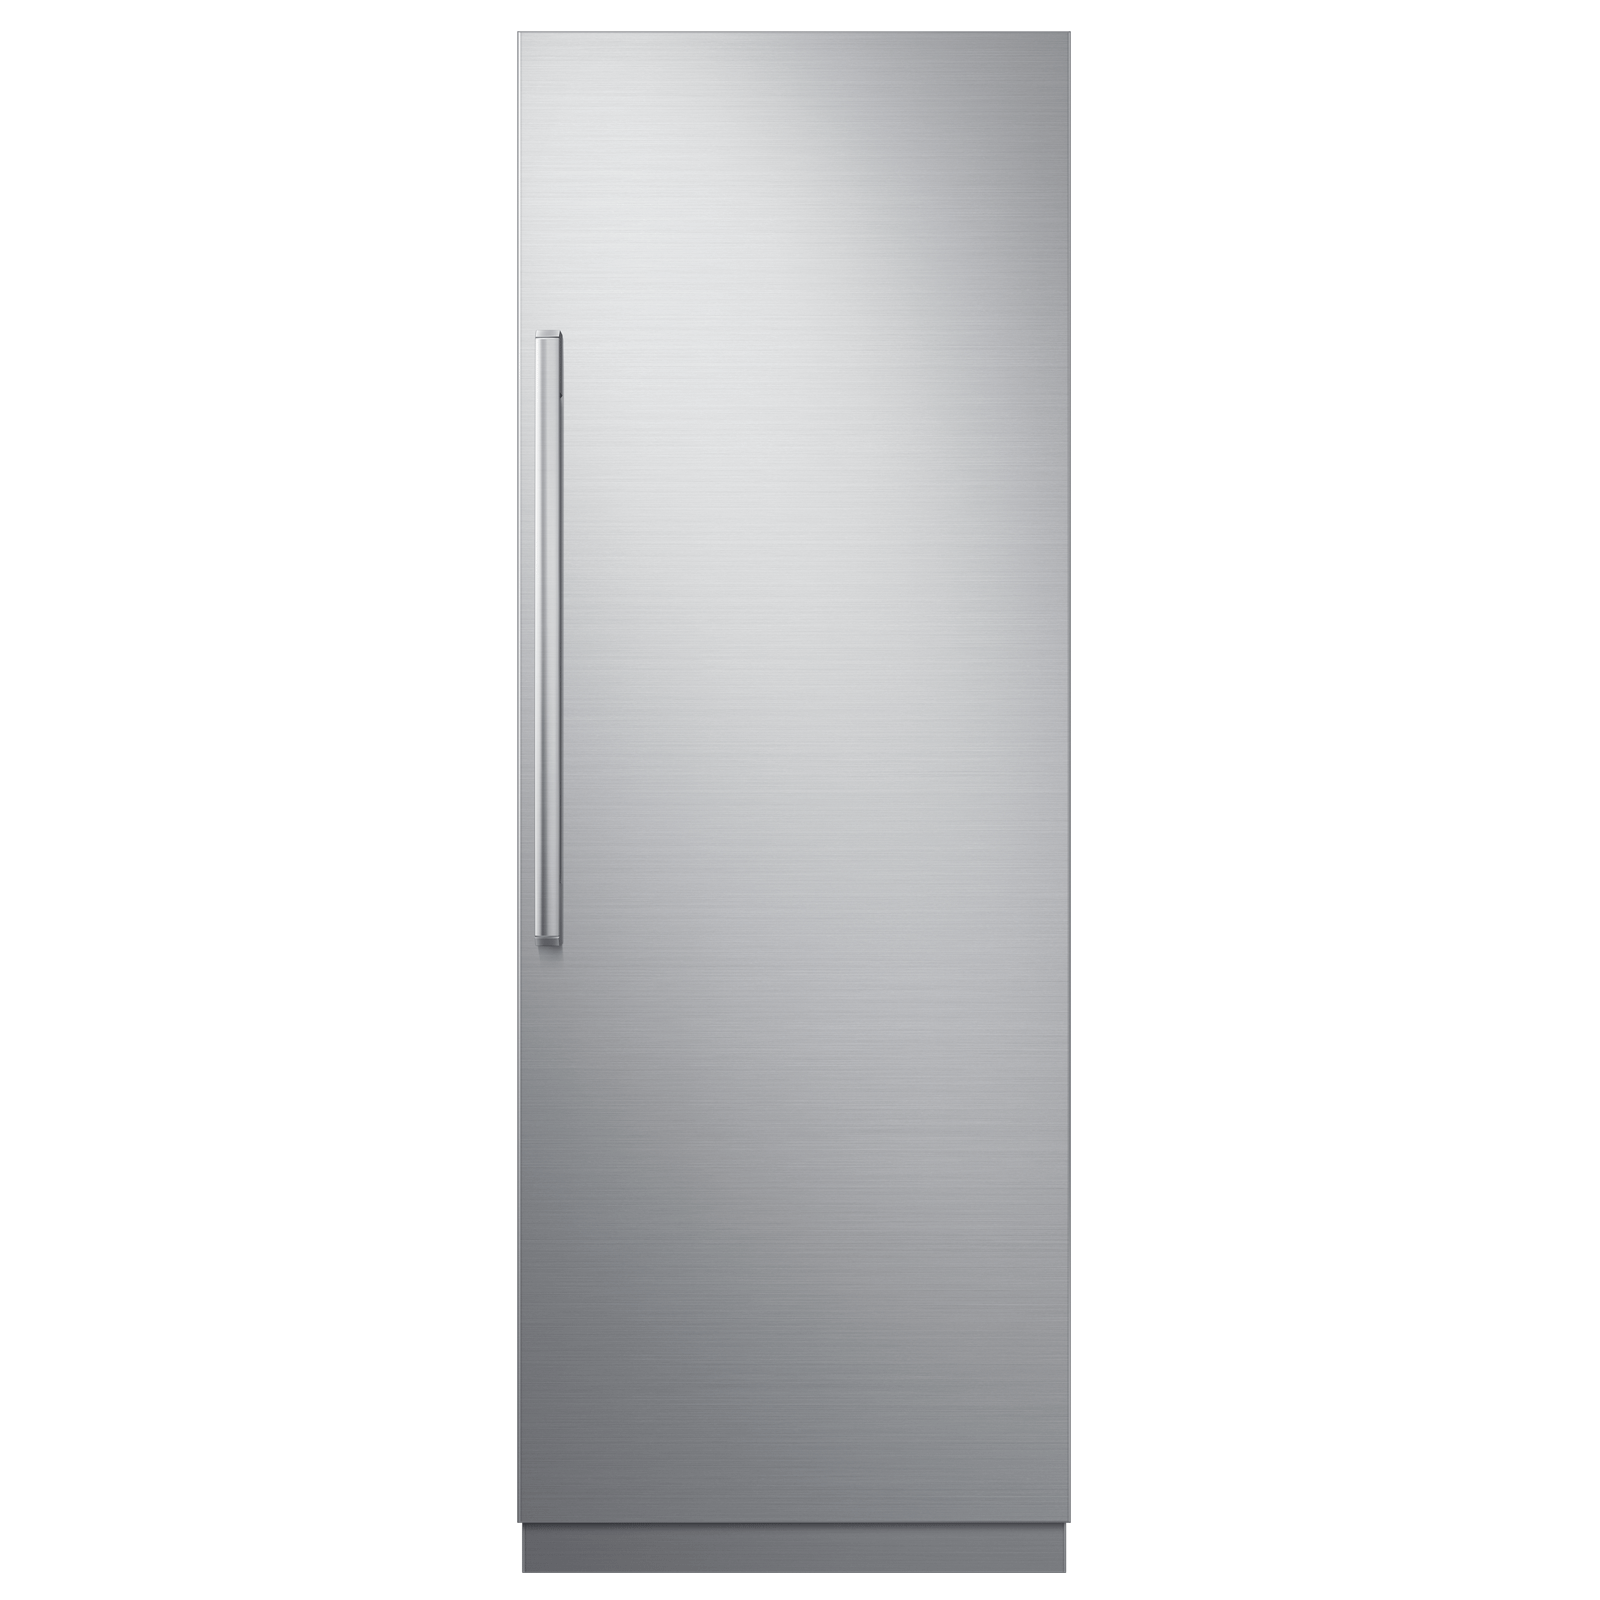 "Dacor Contemporary  30"" Refrigerator Column -  Right Hinge"